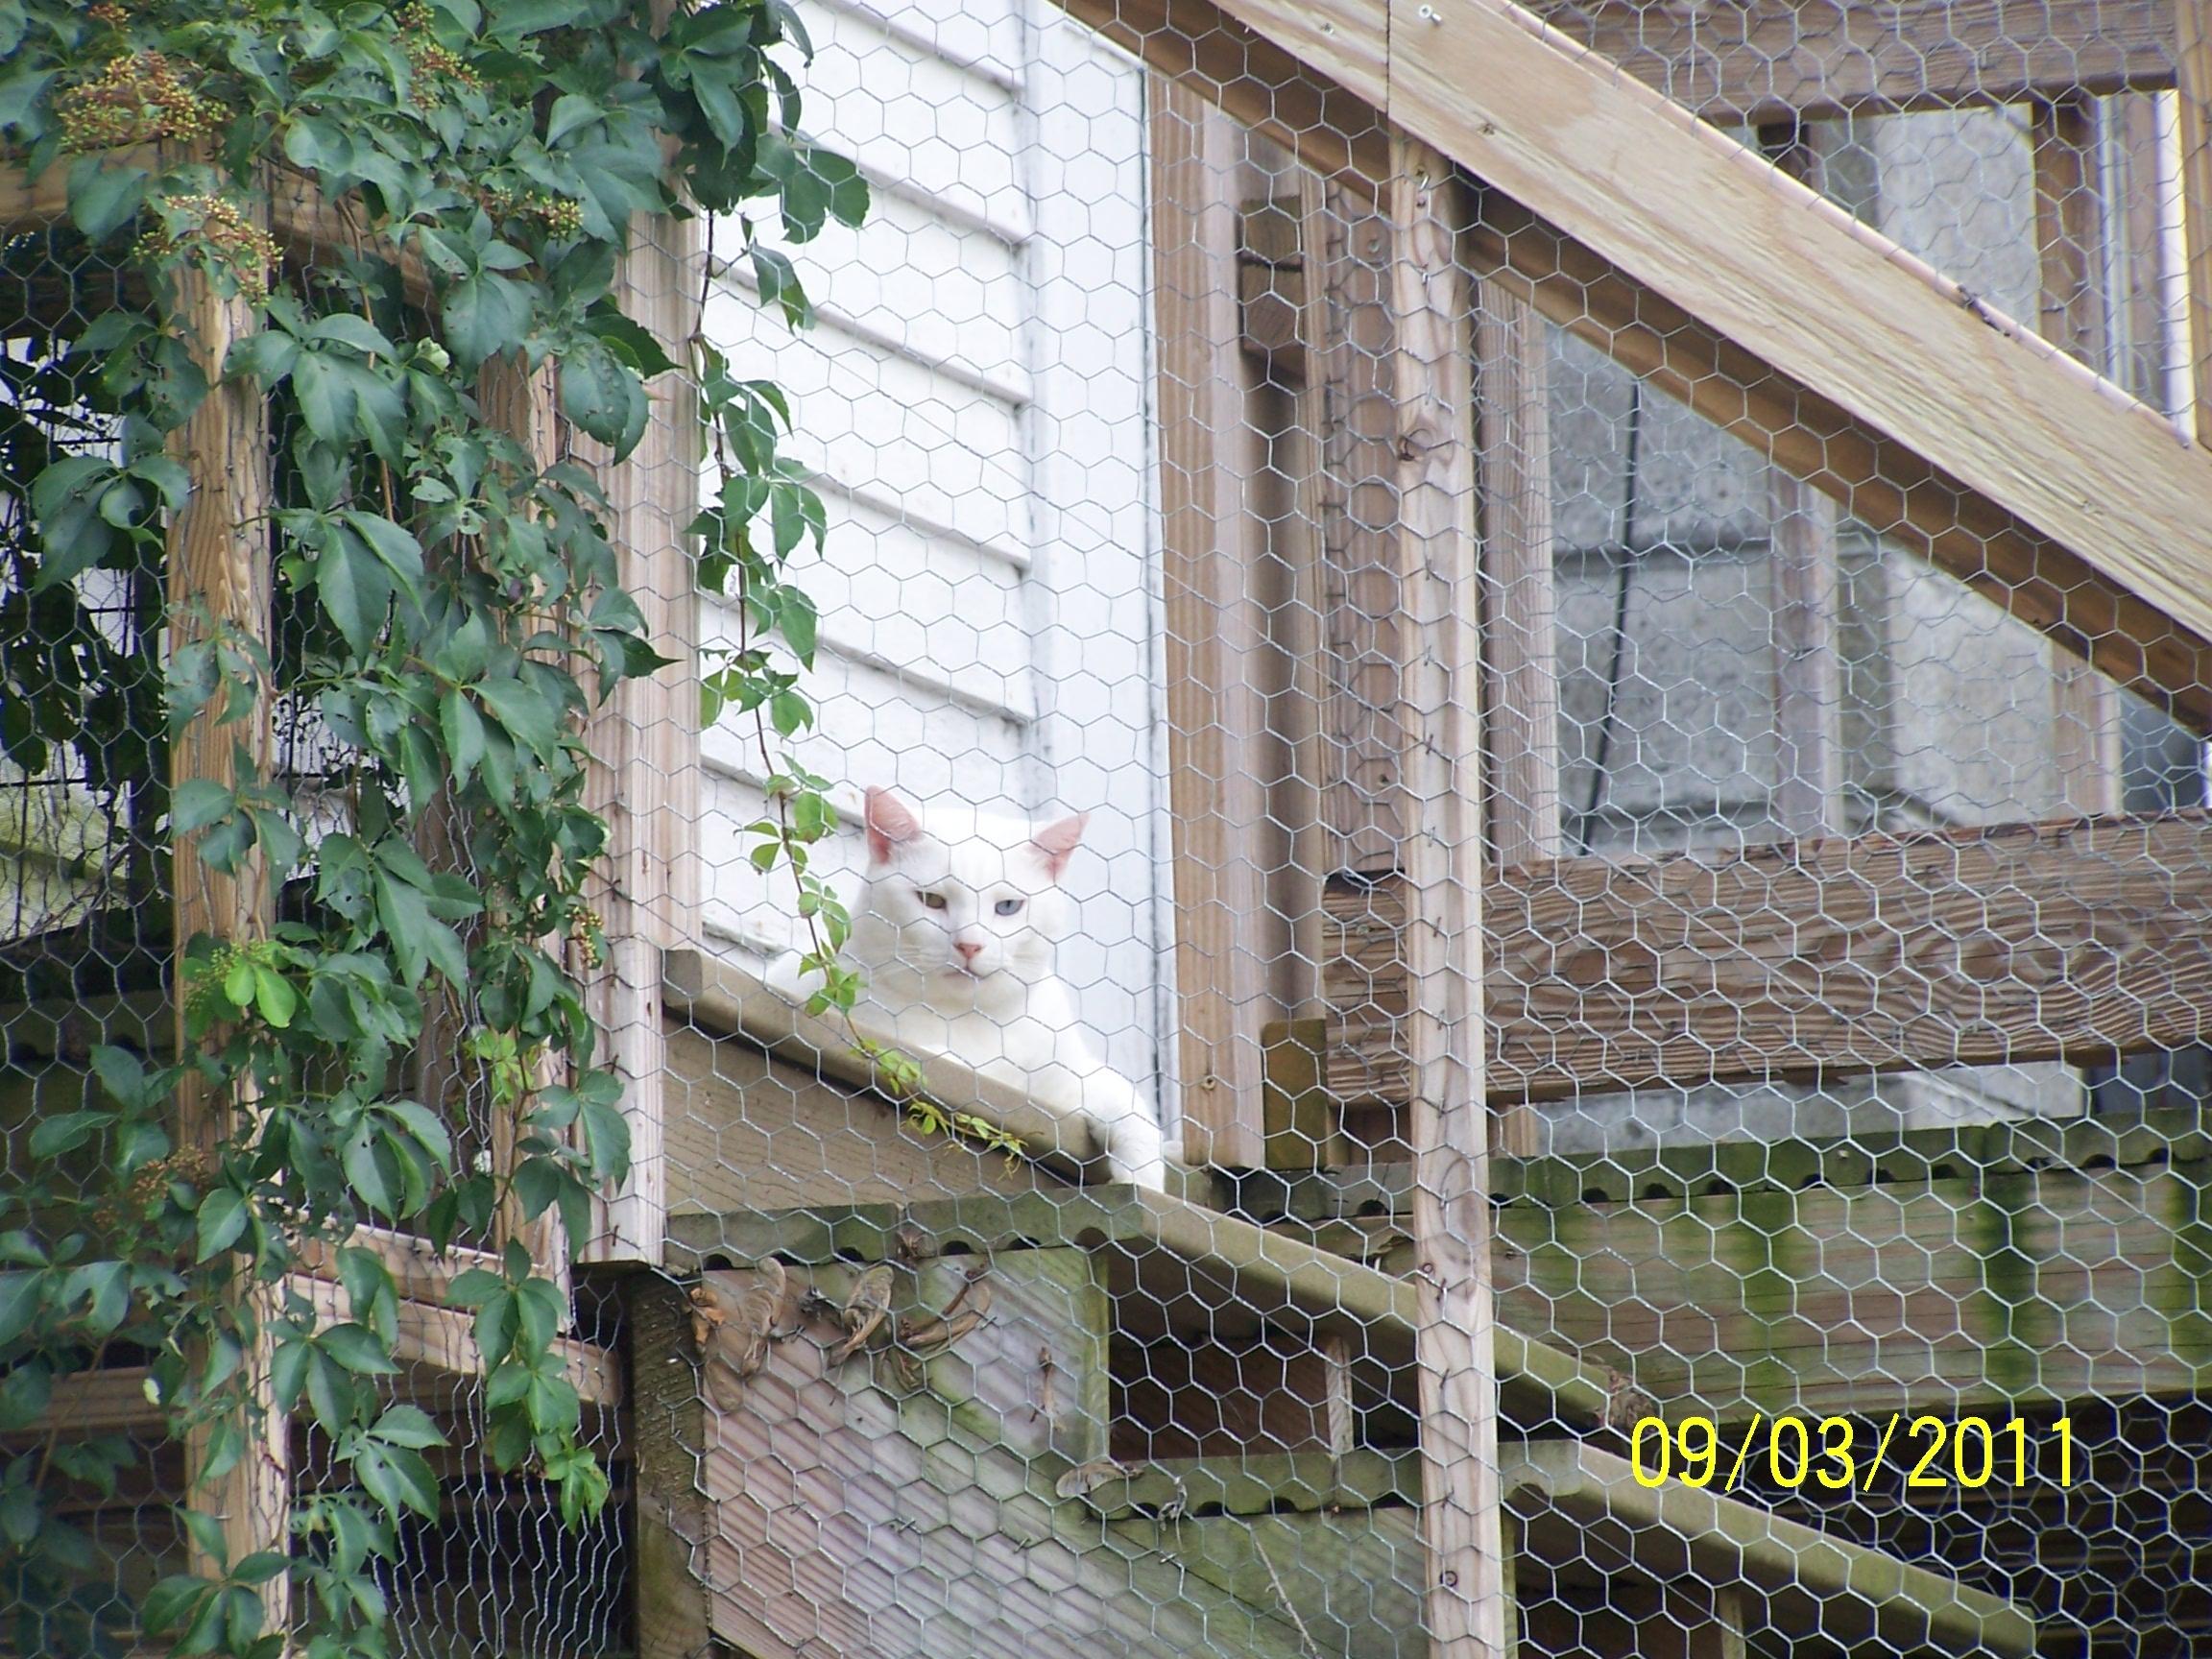 Quaintance Kitty 3.JPG